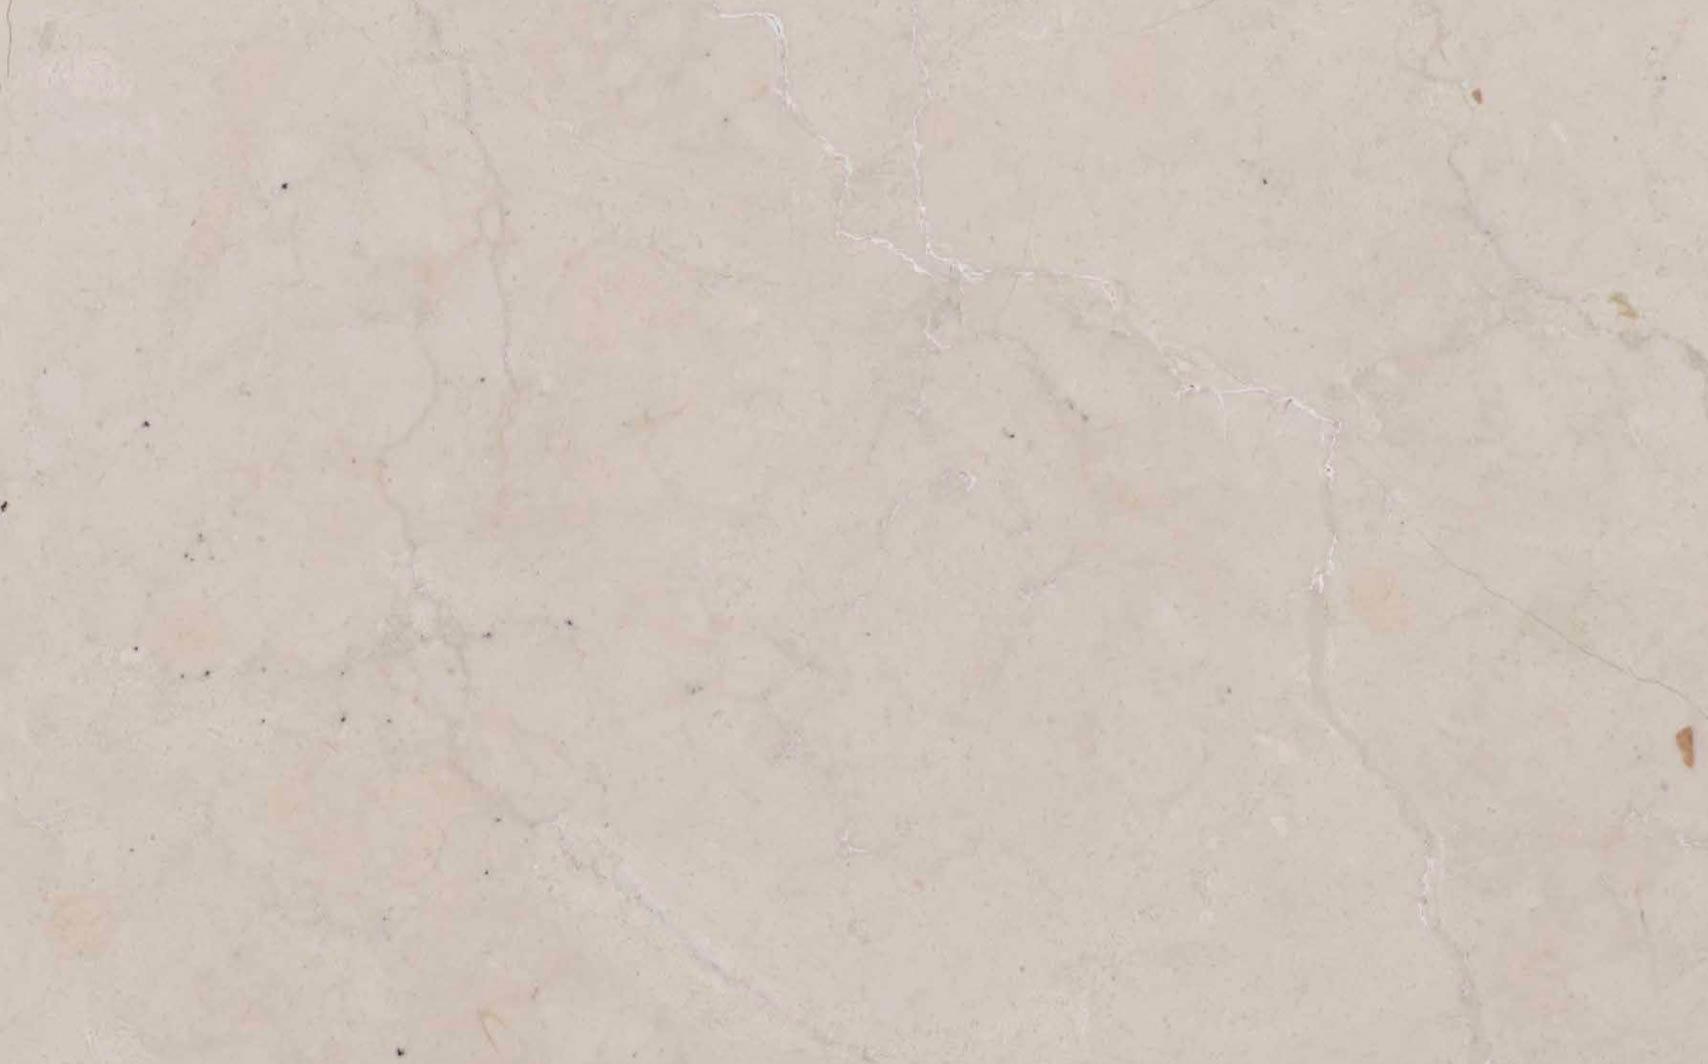 Quintarelli Pietre e Marmi: Lessinia Stone, Verdello Trento, Rosso Trento The enduring beauty of nature White Lessinia Stone